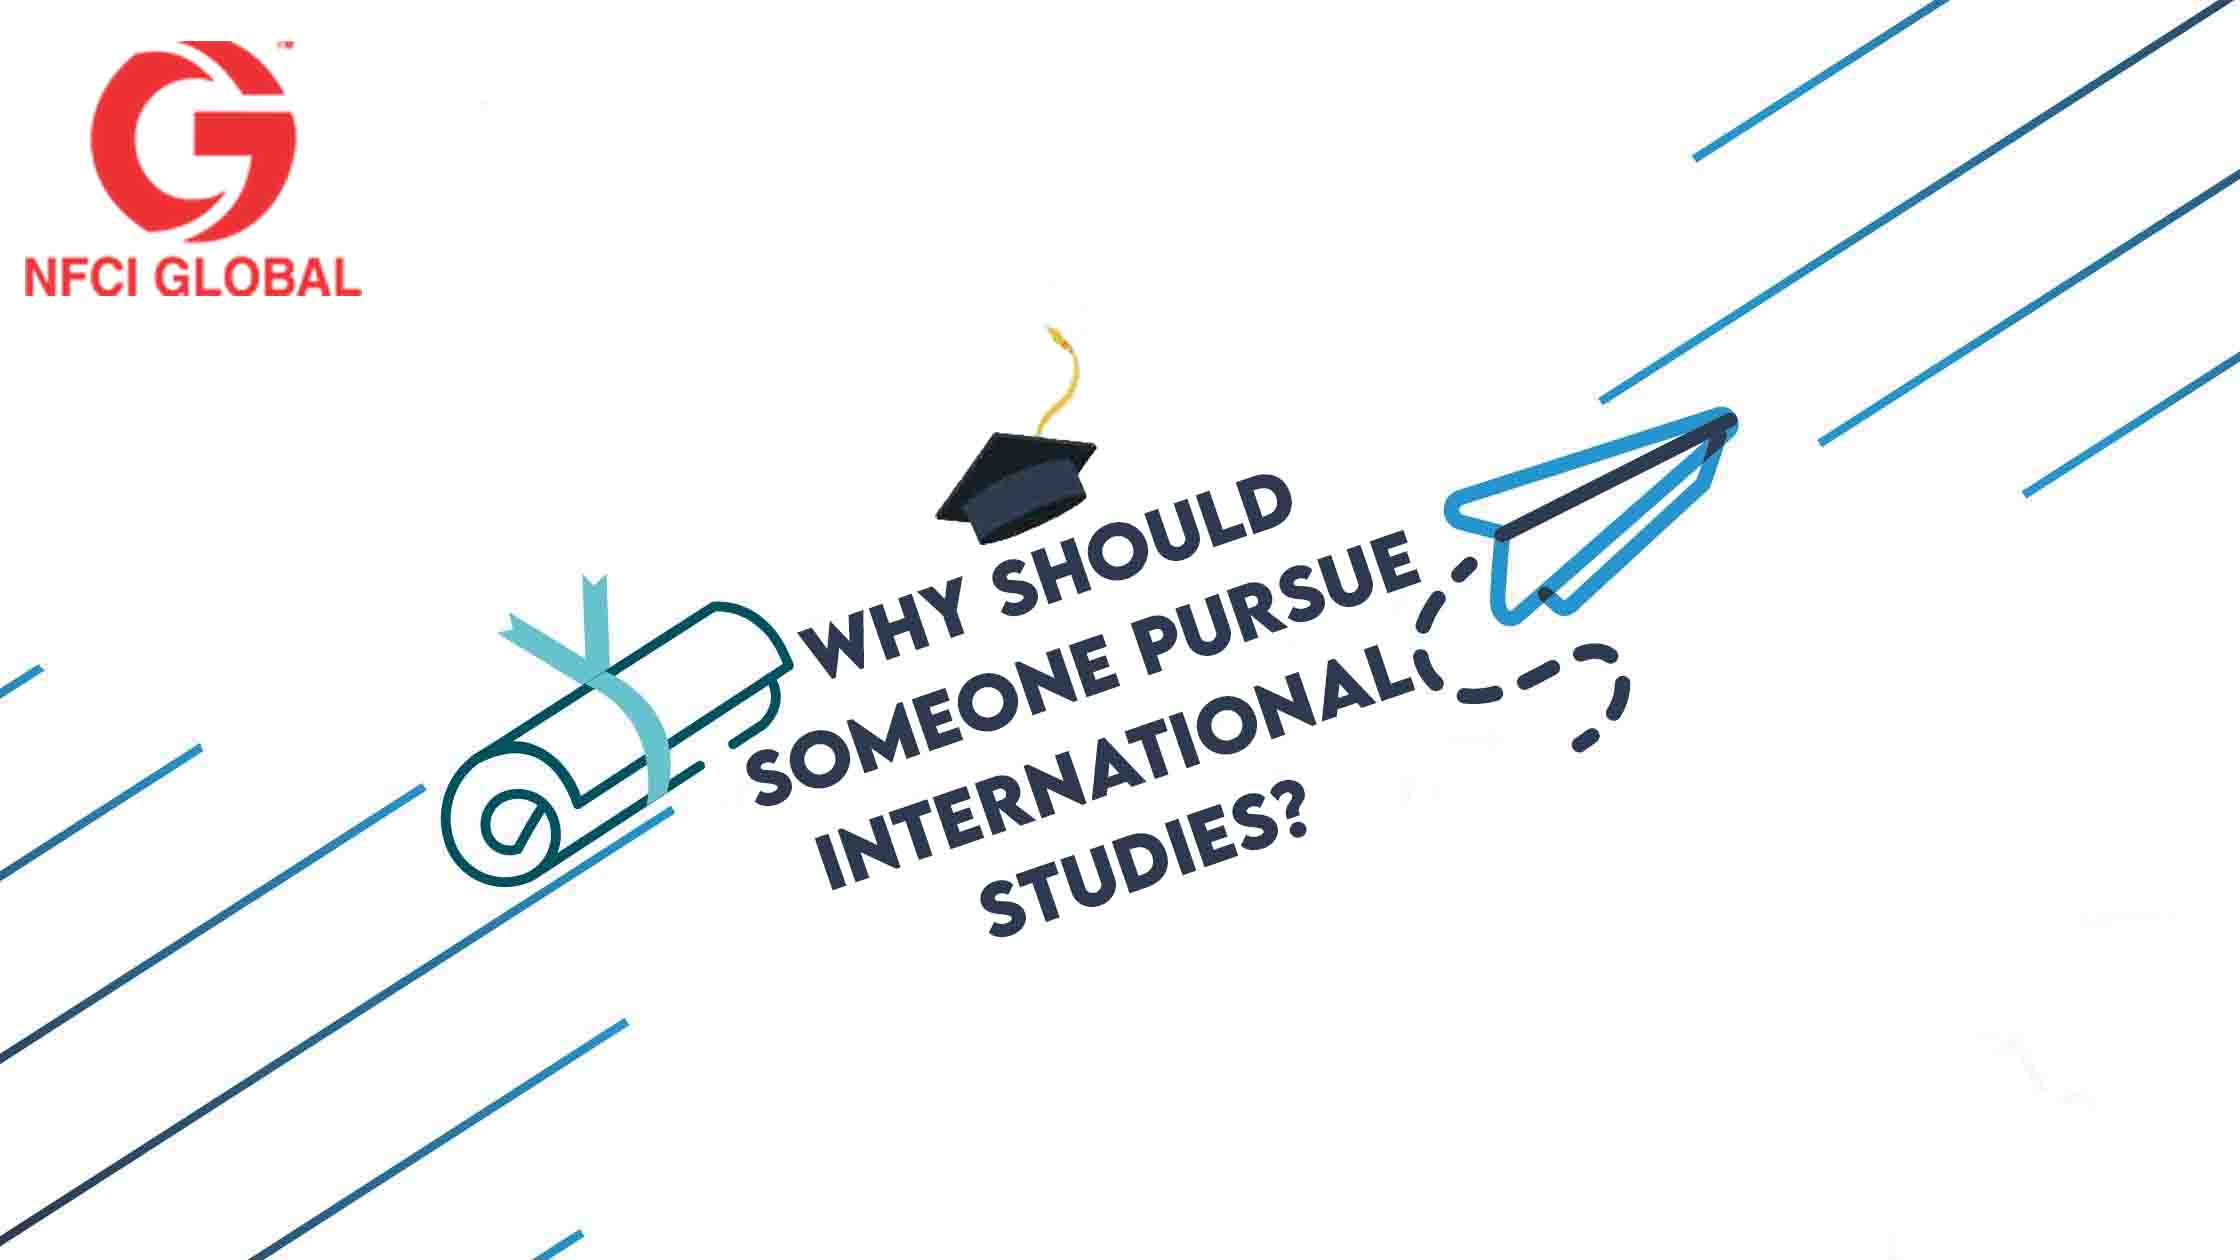 Why should someone pursue International Studies?